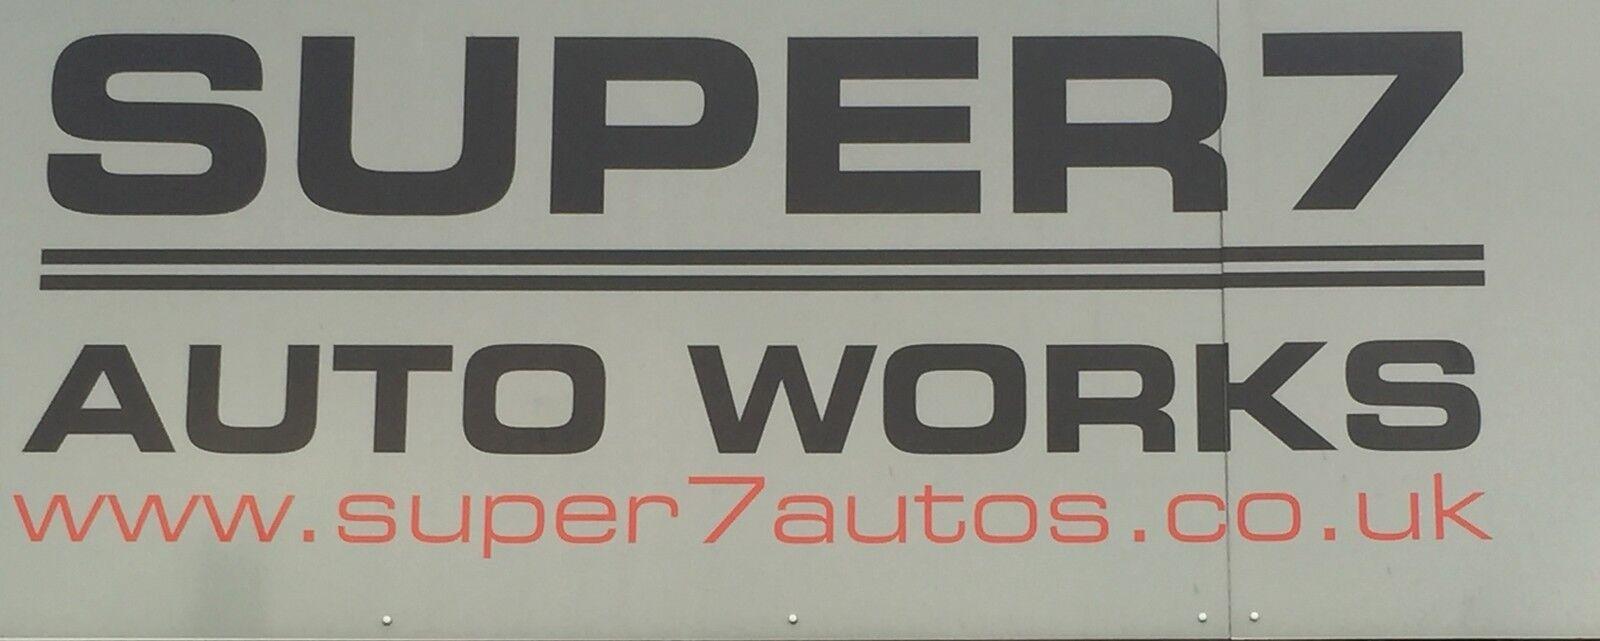 Super Seven Store